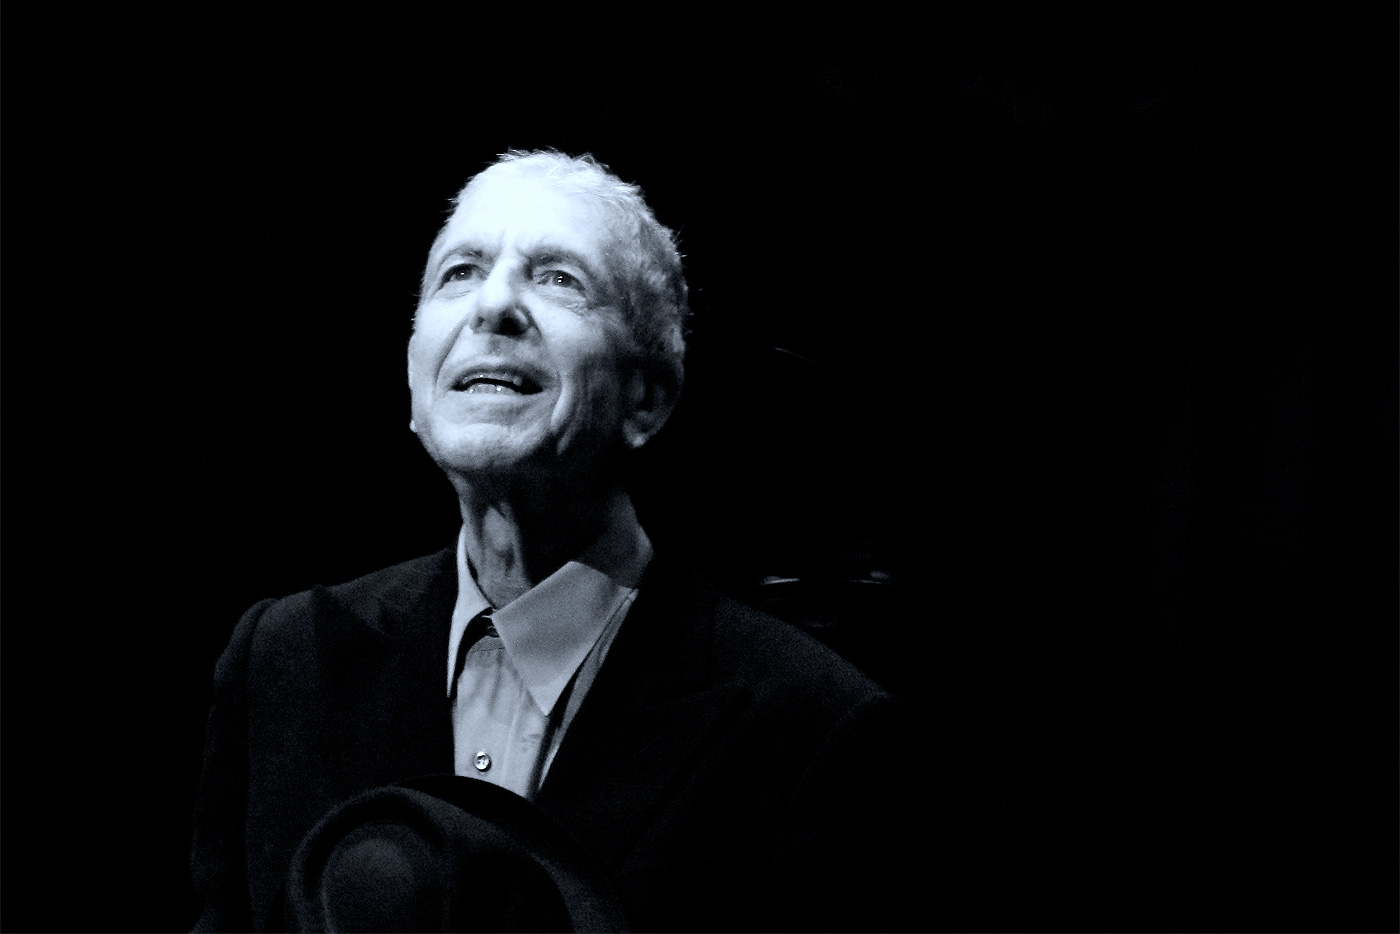 Adiós al poeta canadiense eterno